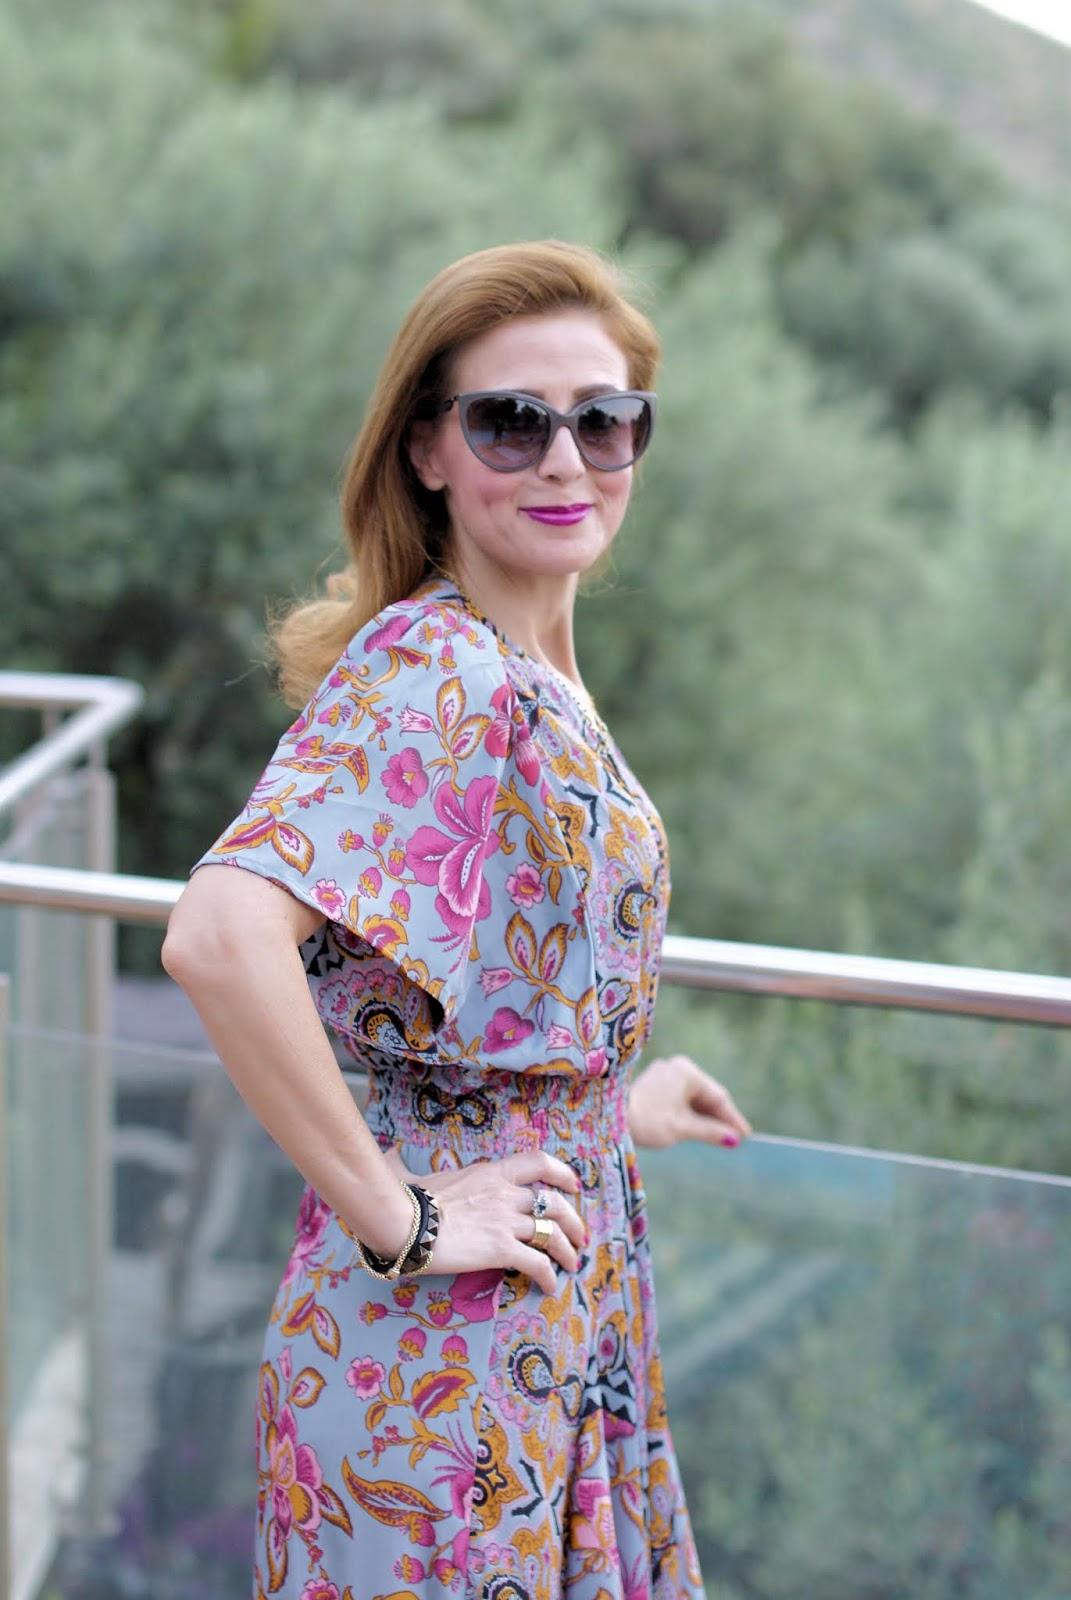 Bohemian Paisley dress on Fashion and Cookies fashion blog, fashion blogger style